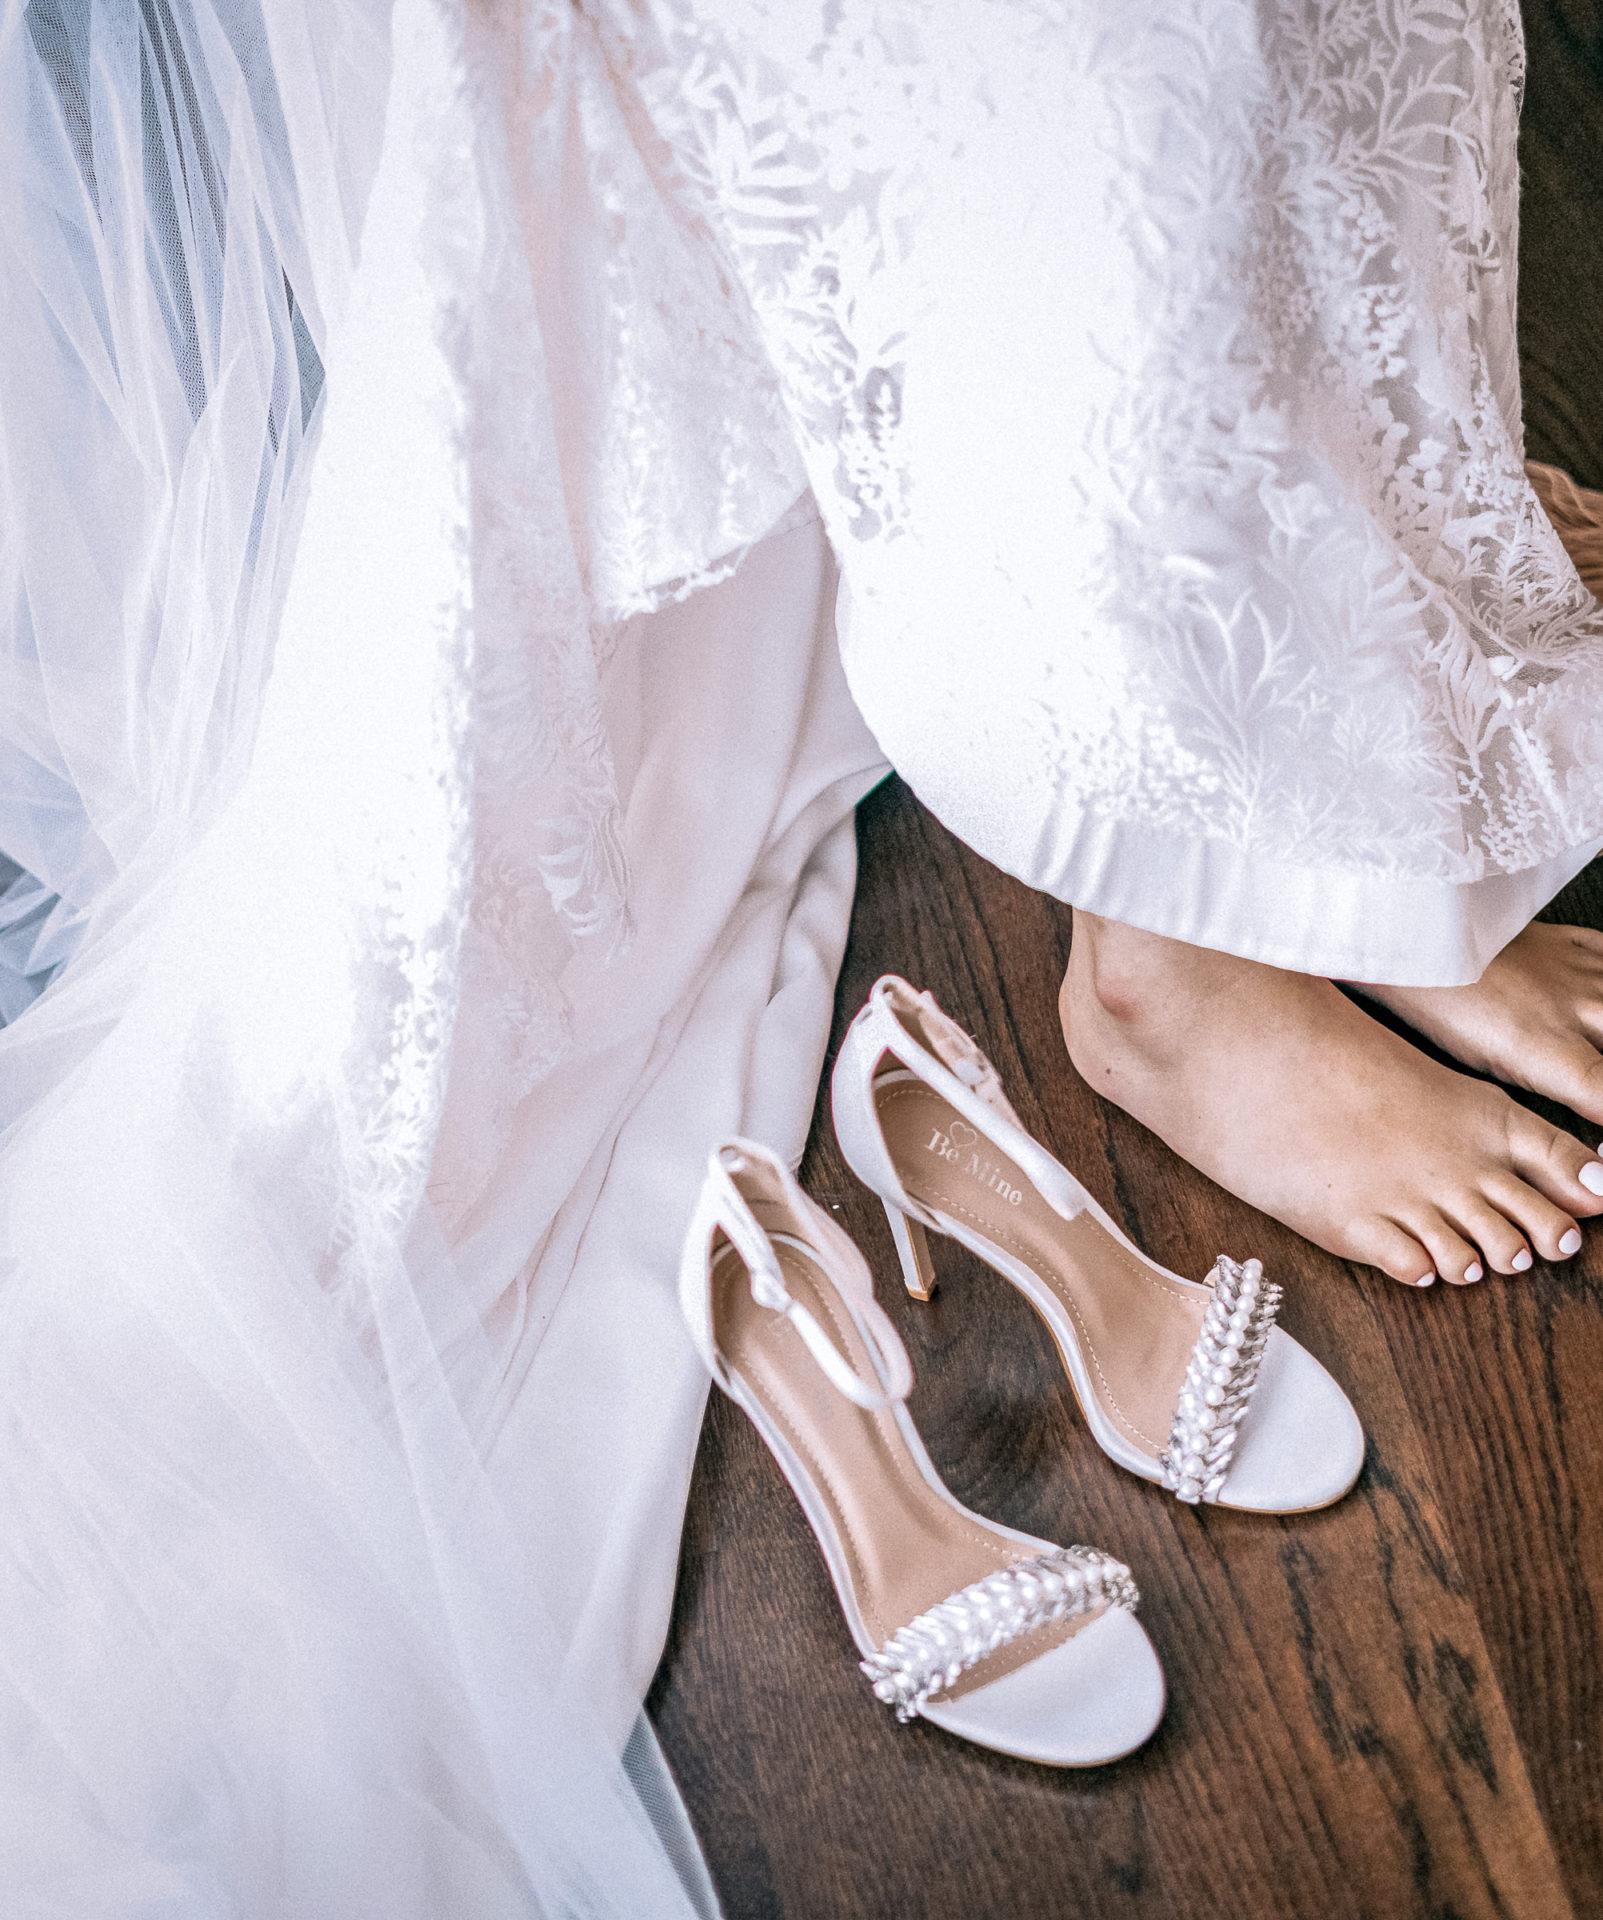 woman-sitting-next-top-open-toe-sandasl-2085524